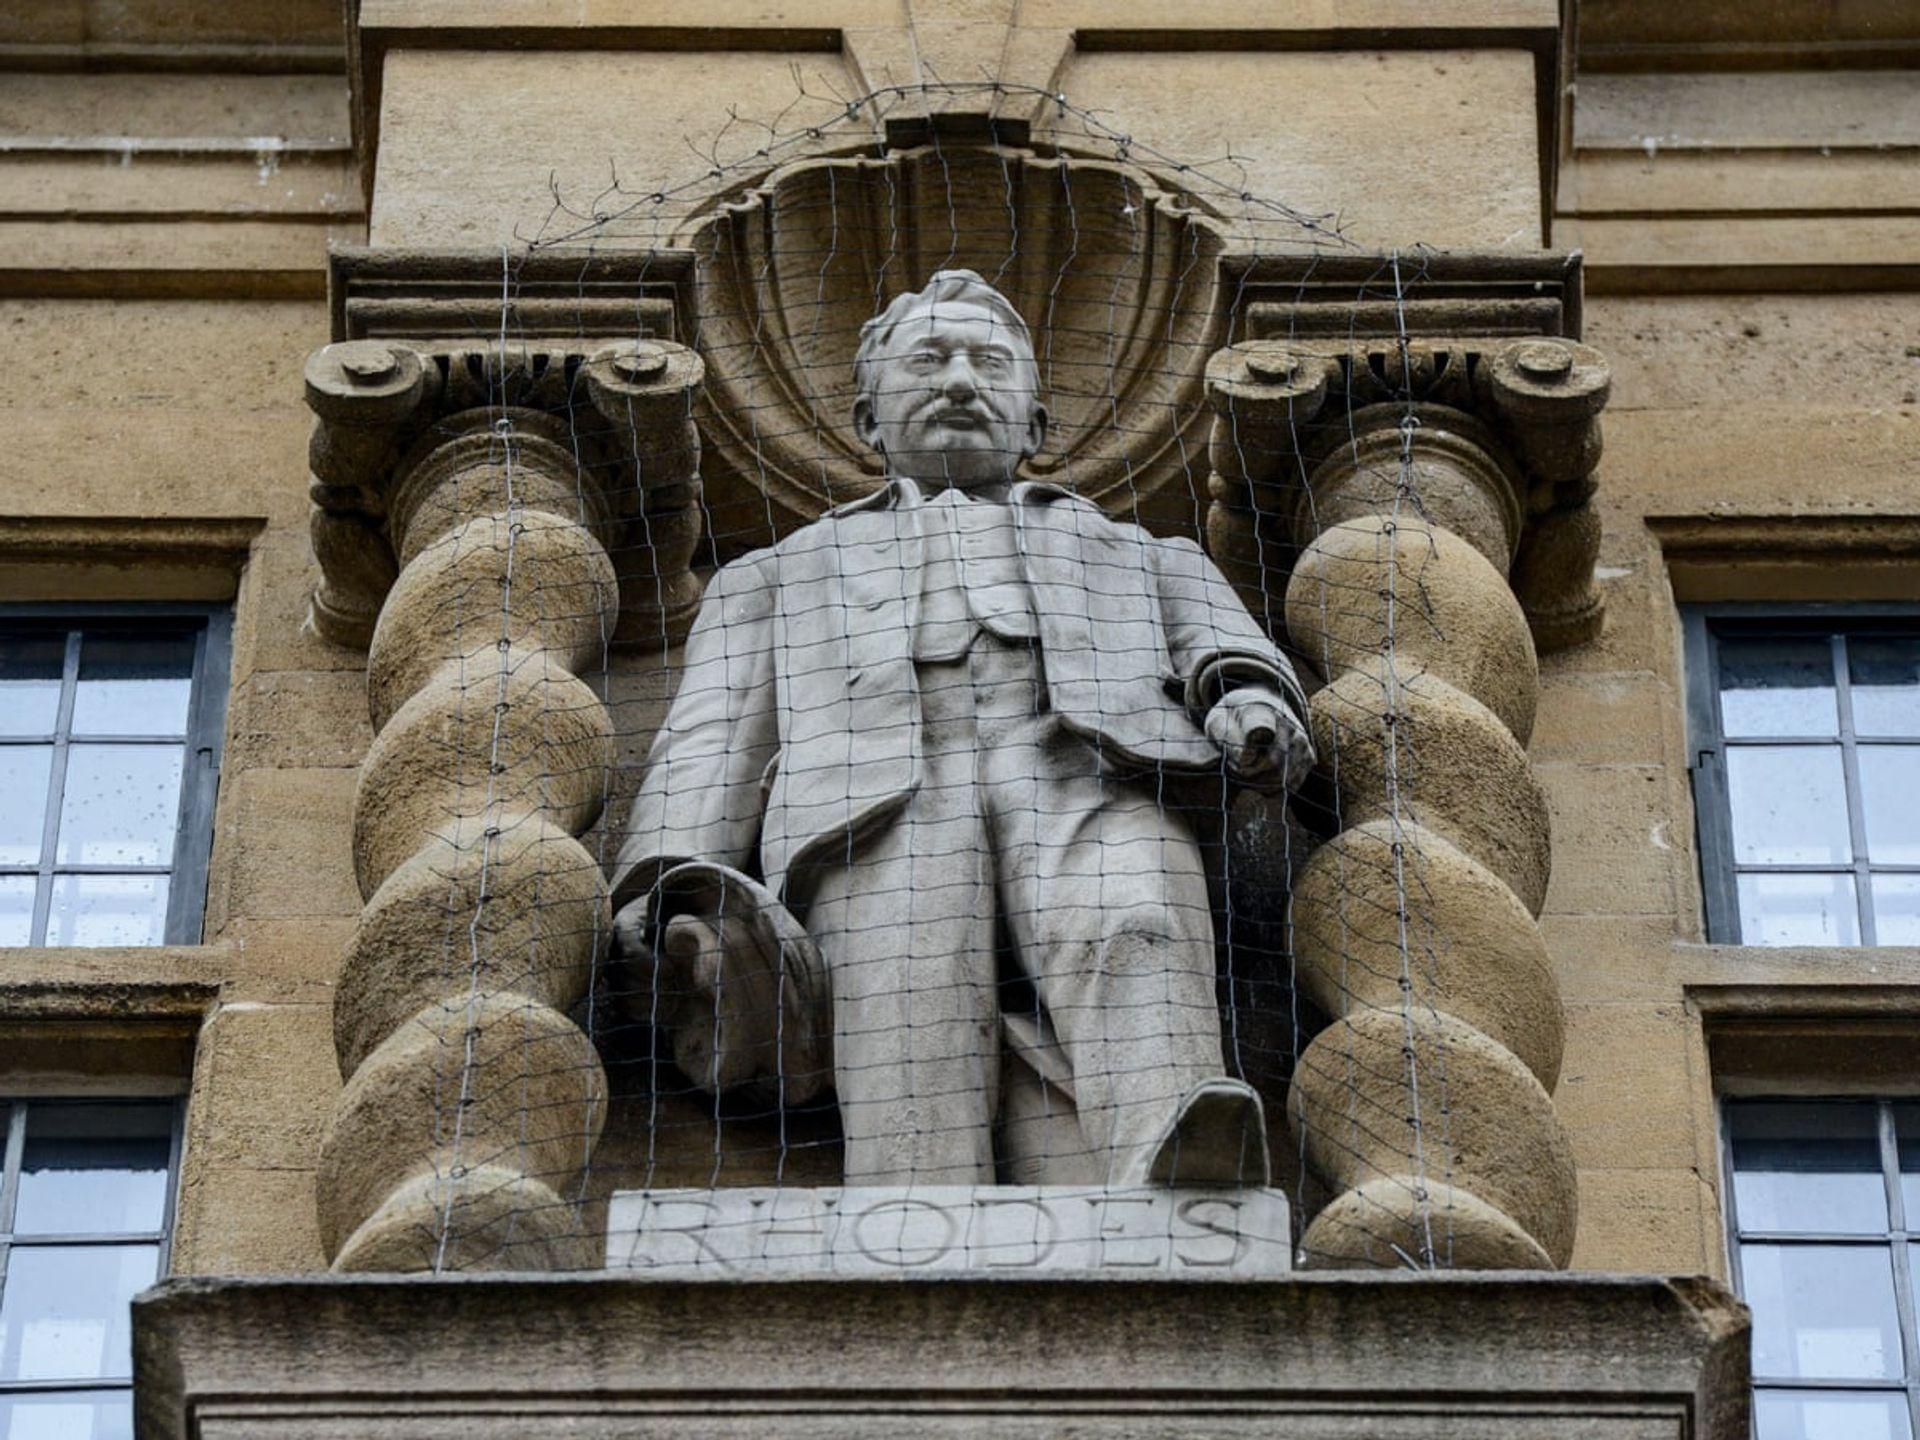 Cecil Rhodes statue at Oriel College, High Street Oxford